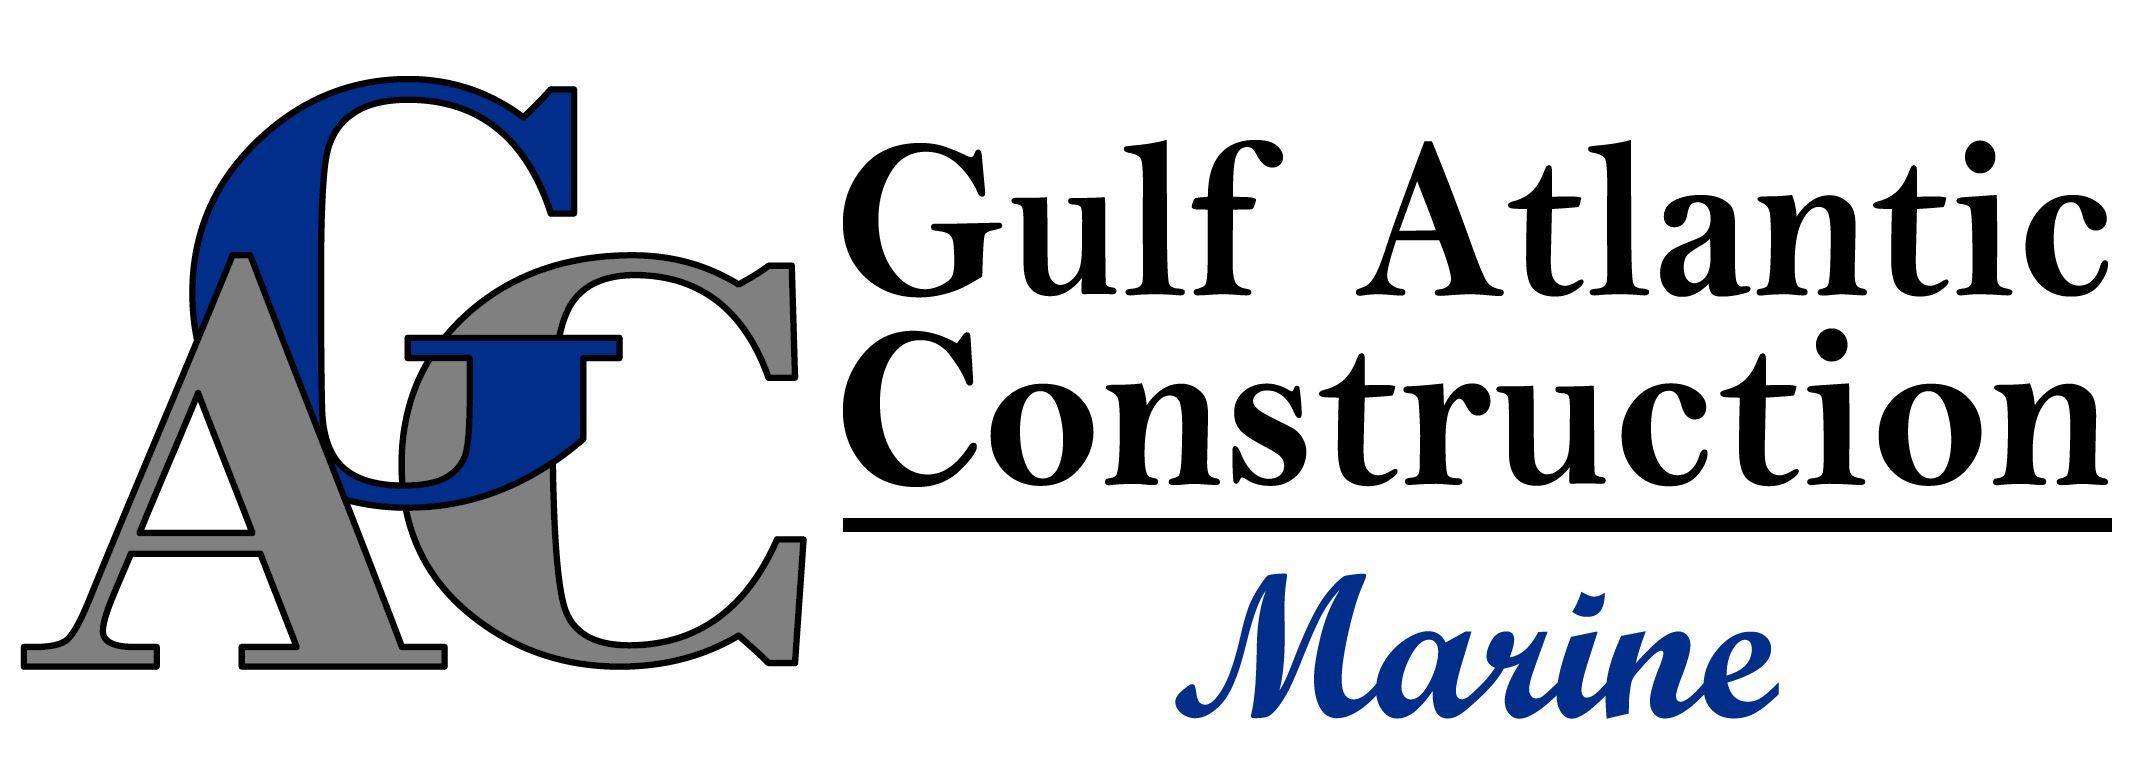 Gulf Atlantic Construction & Marine